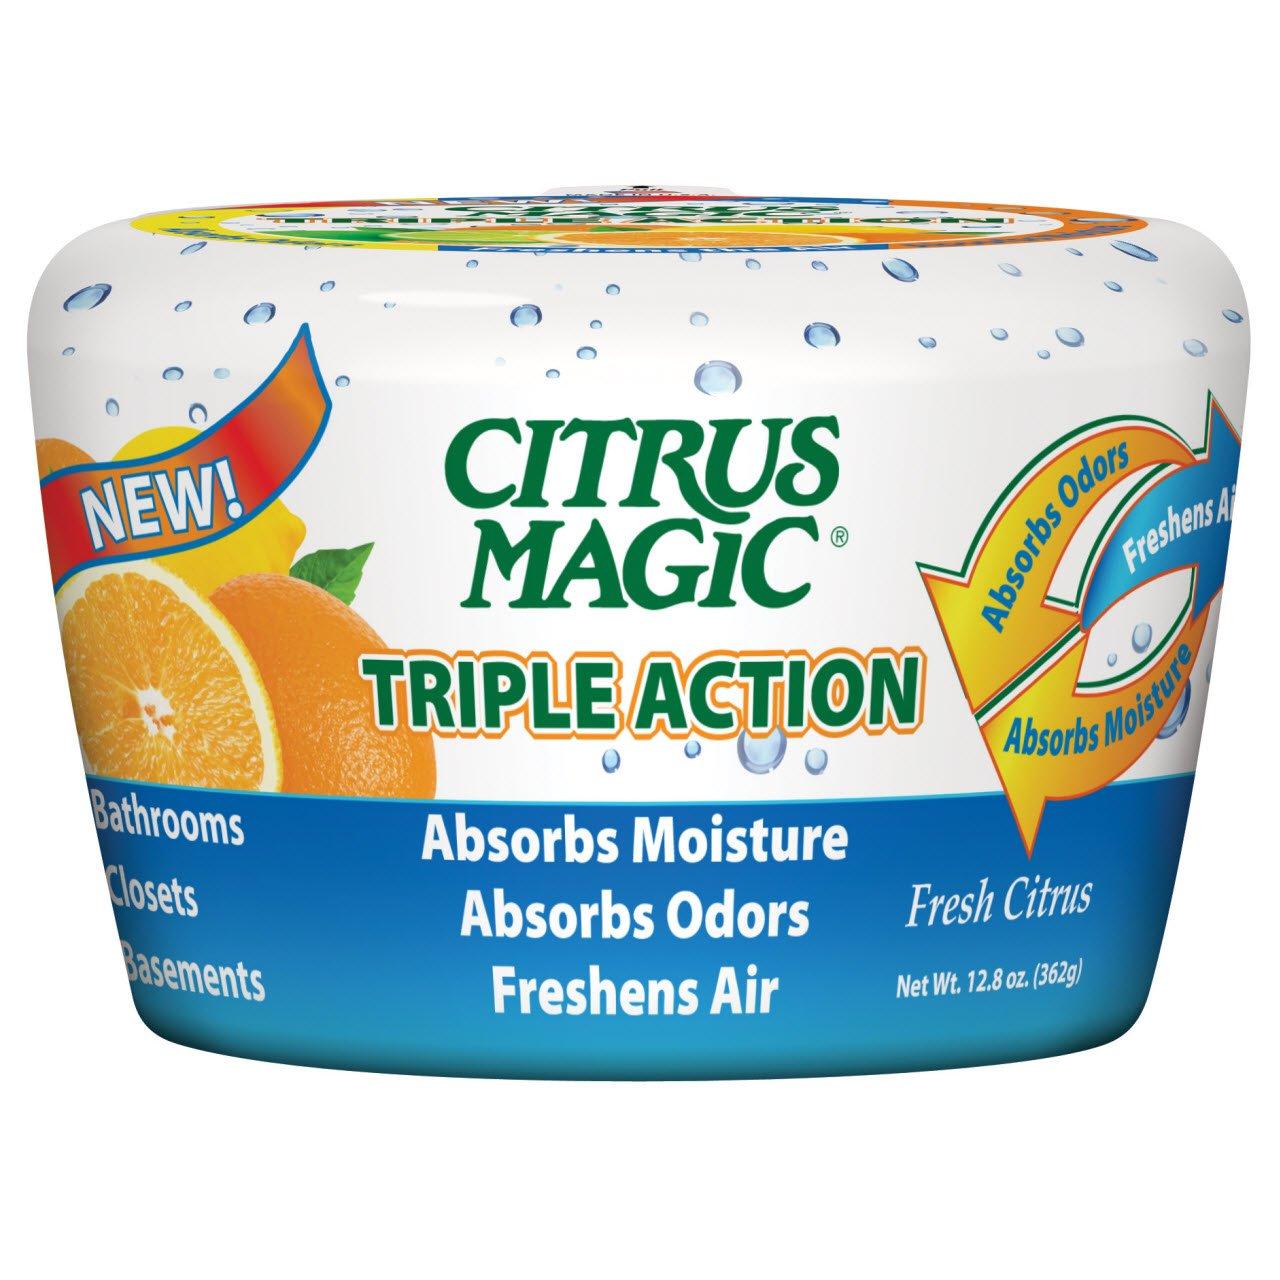 Citrus Magic 618372454 Triple Action Moisture and Odor Absorber Fresh Citrus, 12.8-Ounce